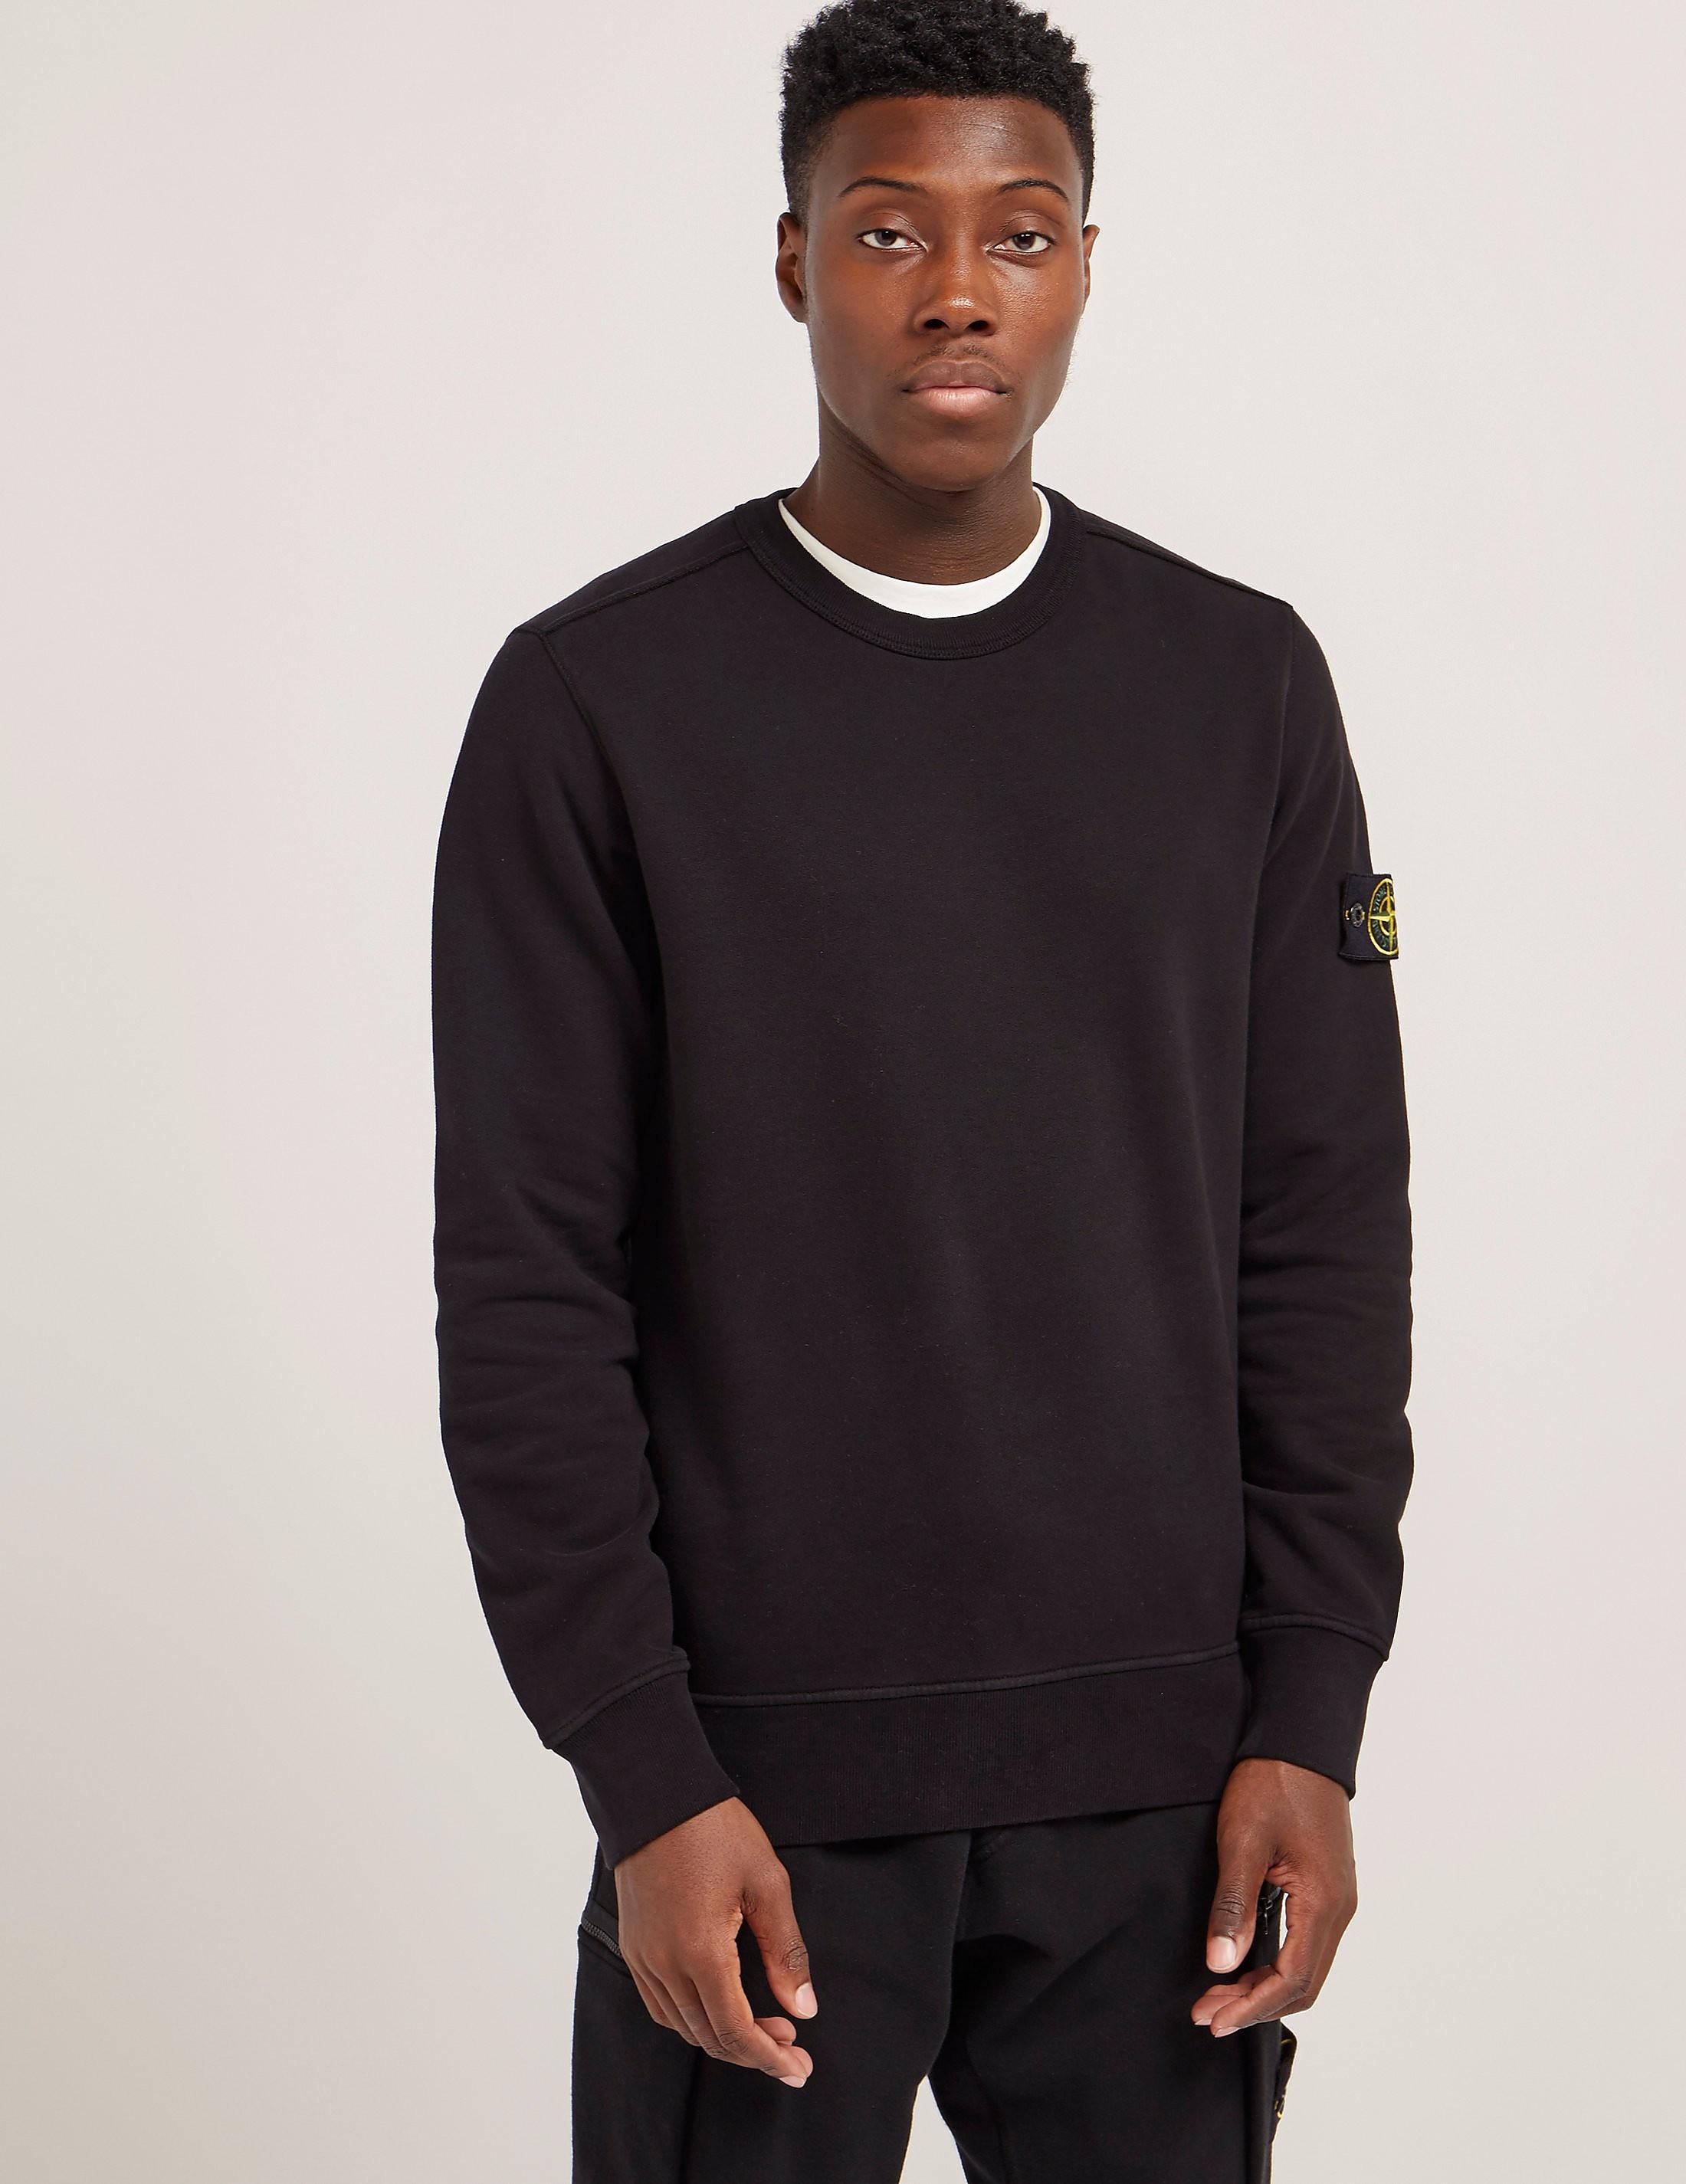 Stone Island Basic Crew Neck Sweatshirt